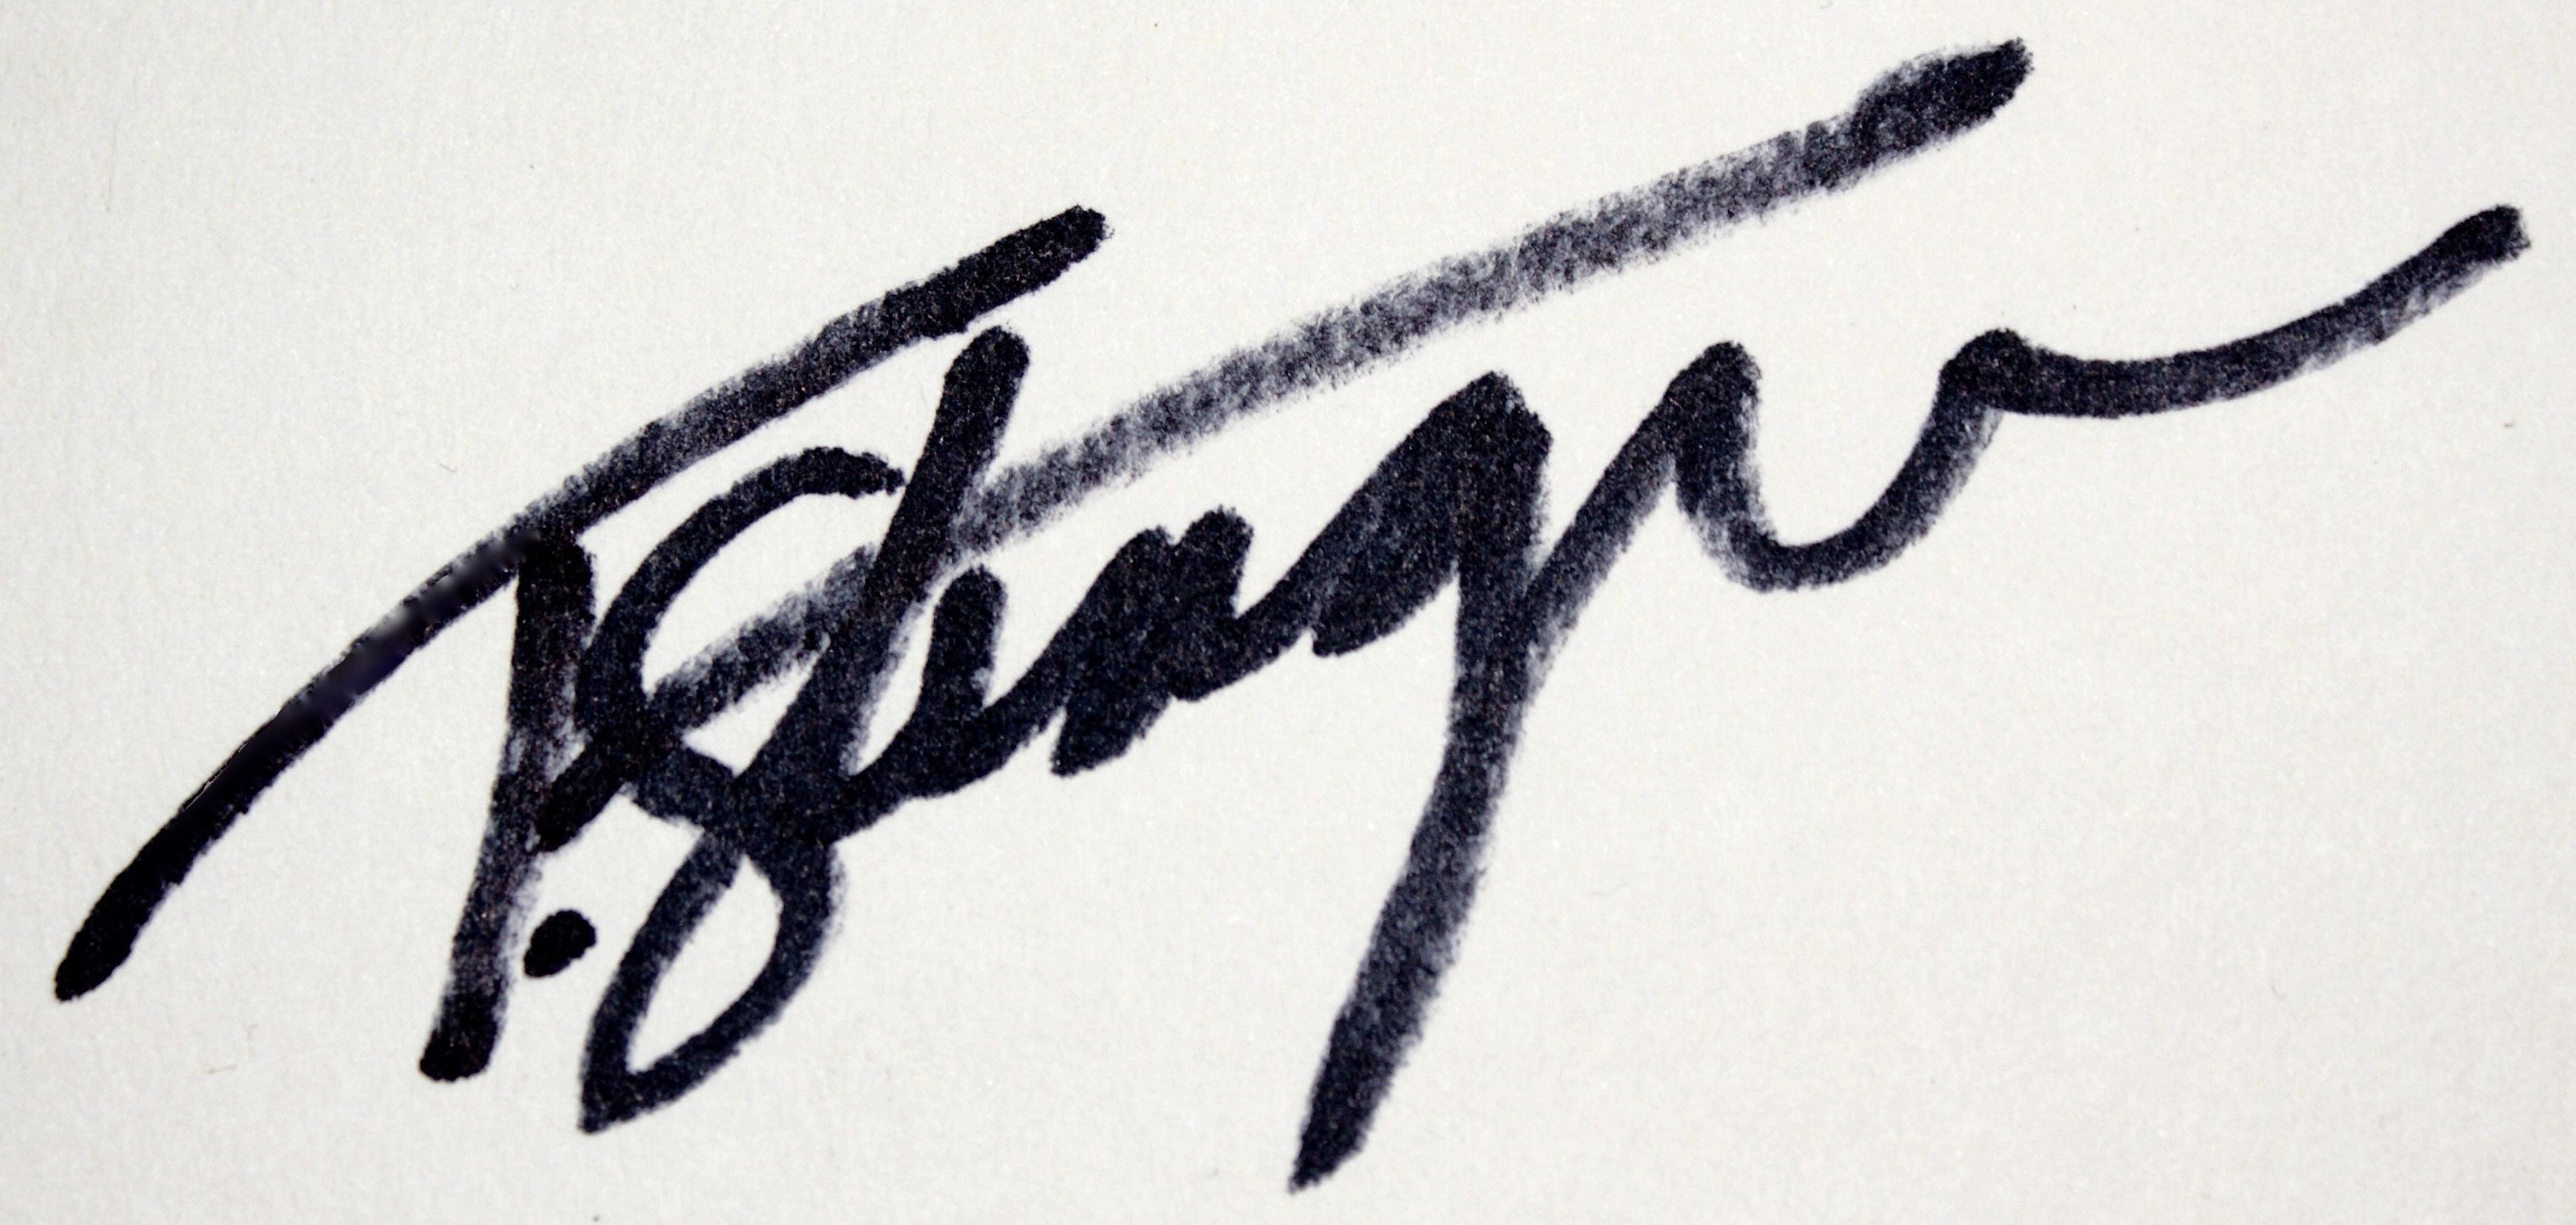 Tony Stenger's Signature